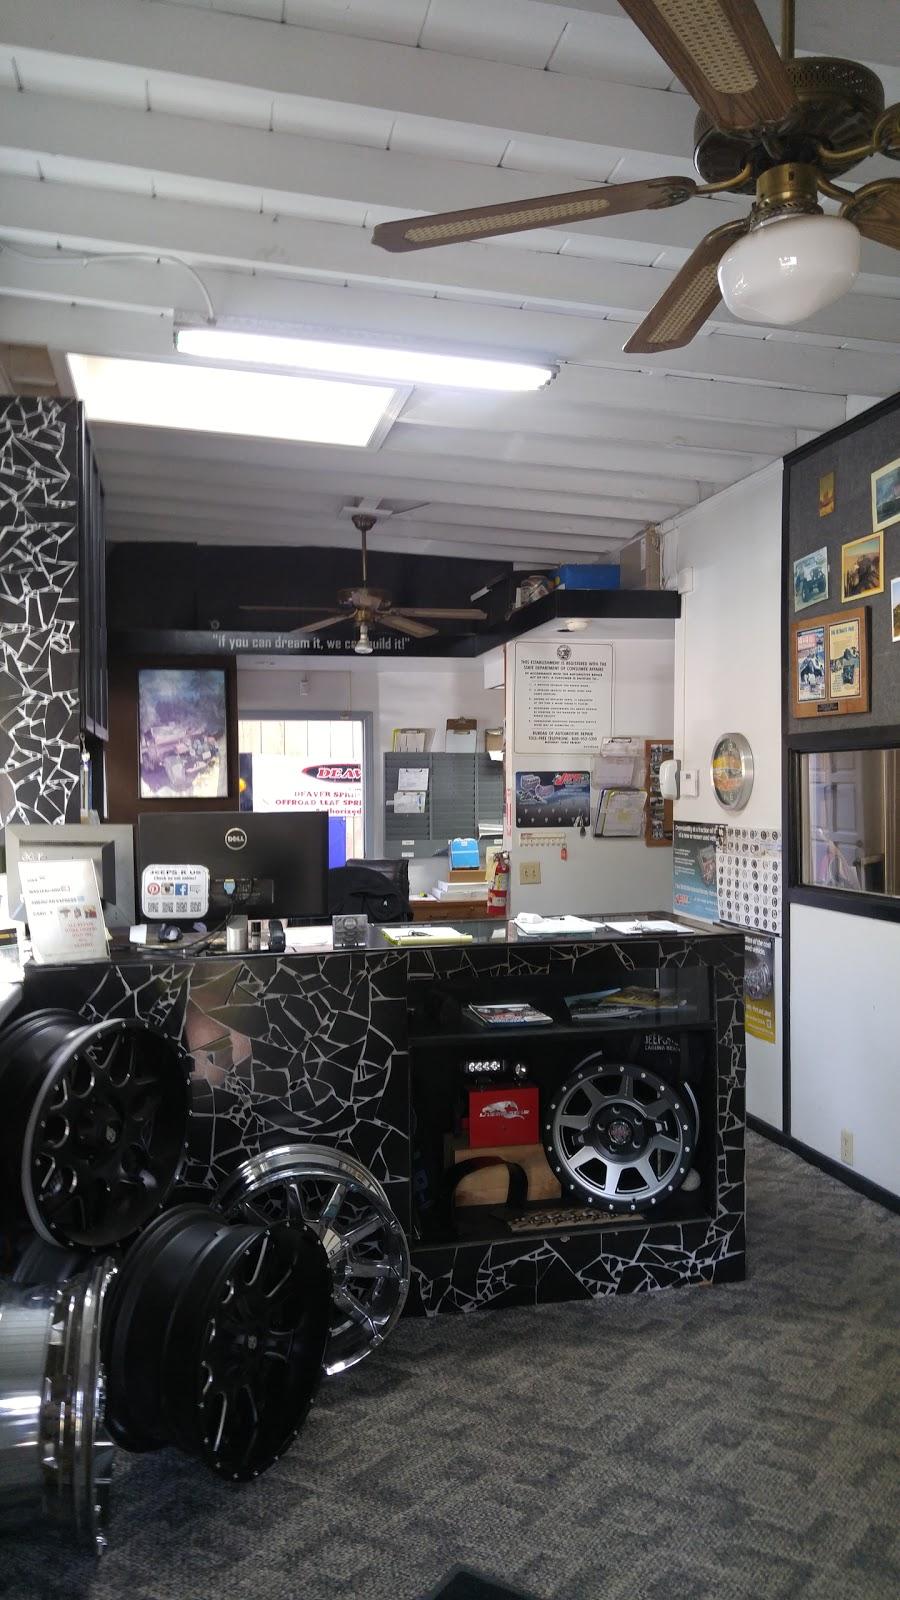 Jeeps R Us - car dealer  | Photo 10 of 10 | Address: 3231 Laguna Canyon Rd, Laguna Beach, CA 92651, USA | Phone: (949) 497-9183